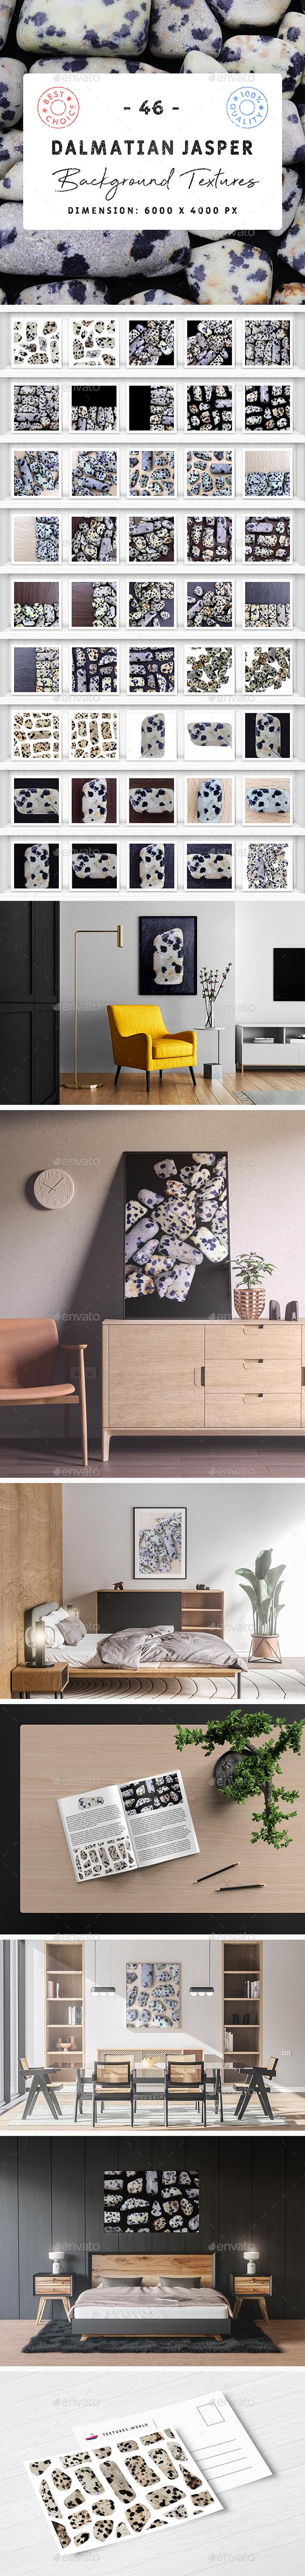 46 Dalmatian Jasper Background Textures